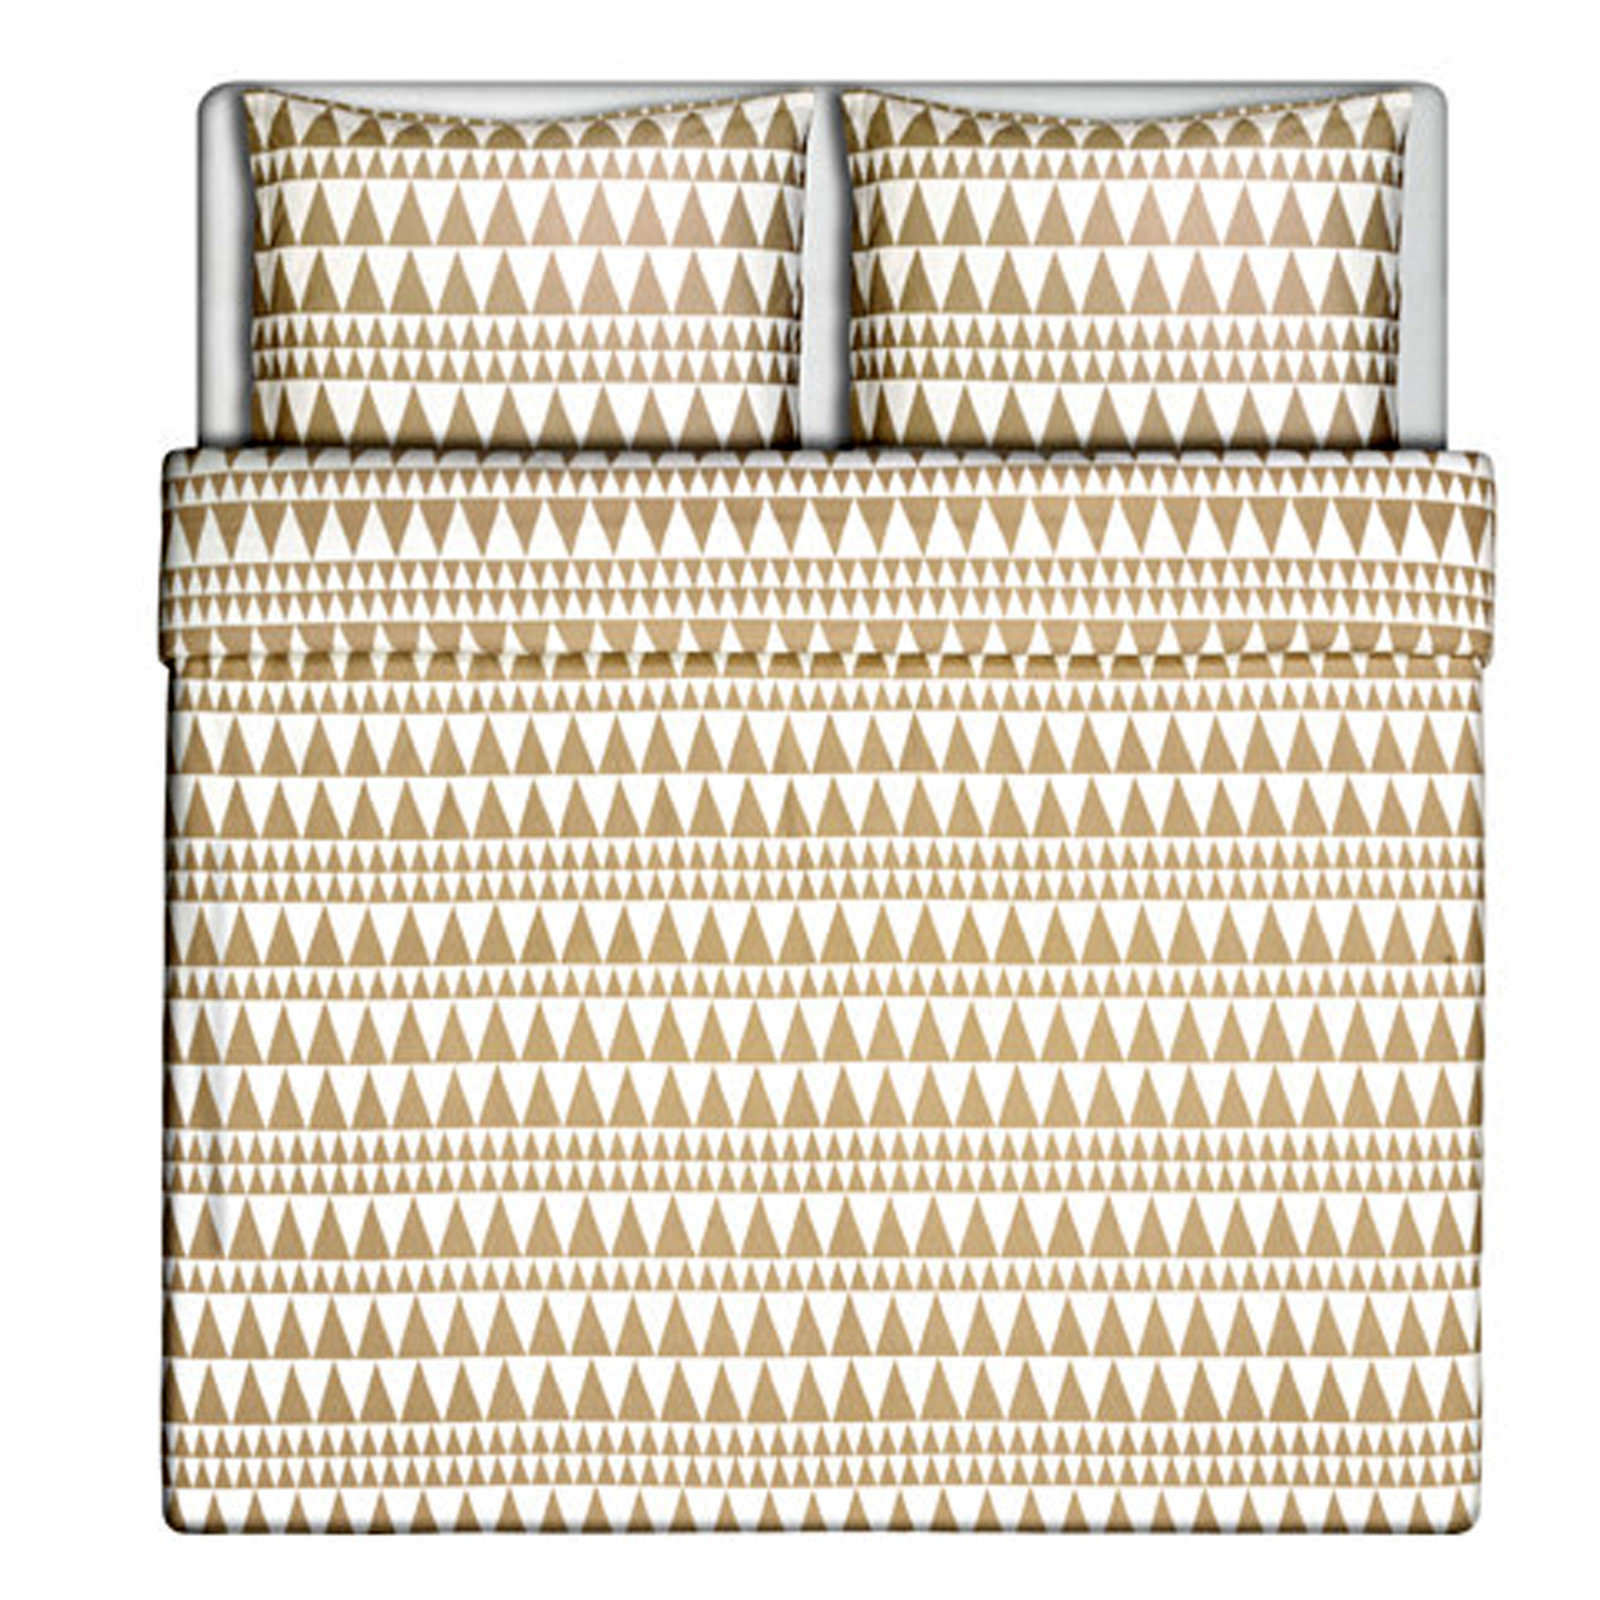 ikea blasuga 3 tlg winter bettw sche set 240 220 cm warm bettbezug beige neu ovp traumfabrik xxl. Black Bedroom Furniture Sets. Home Design Ideas